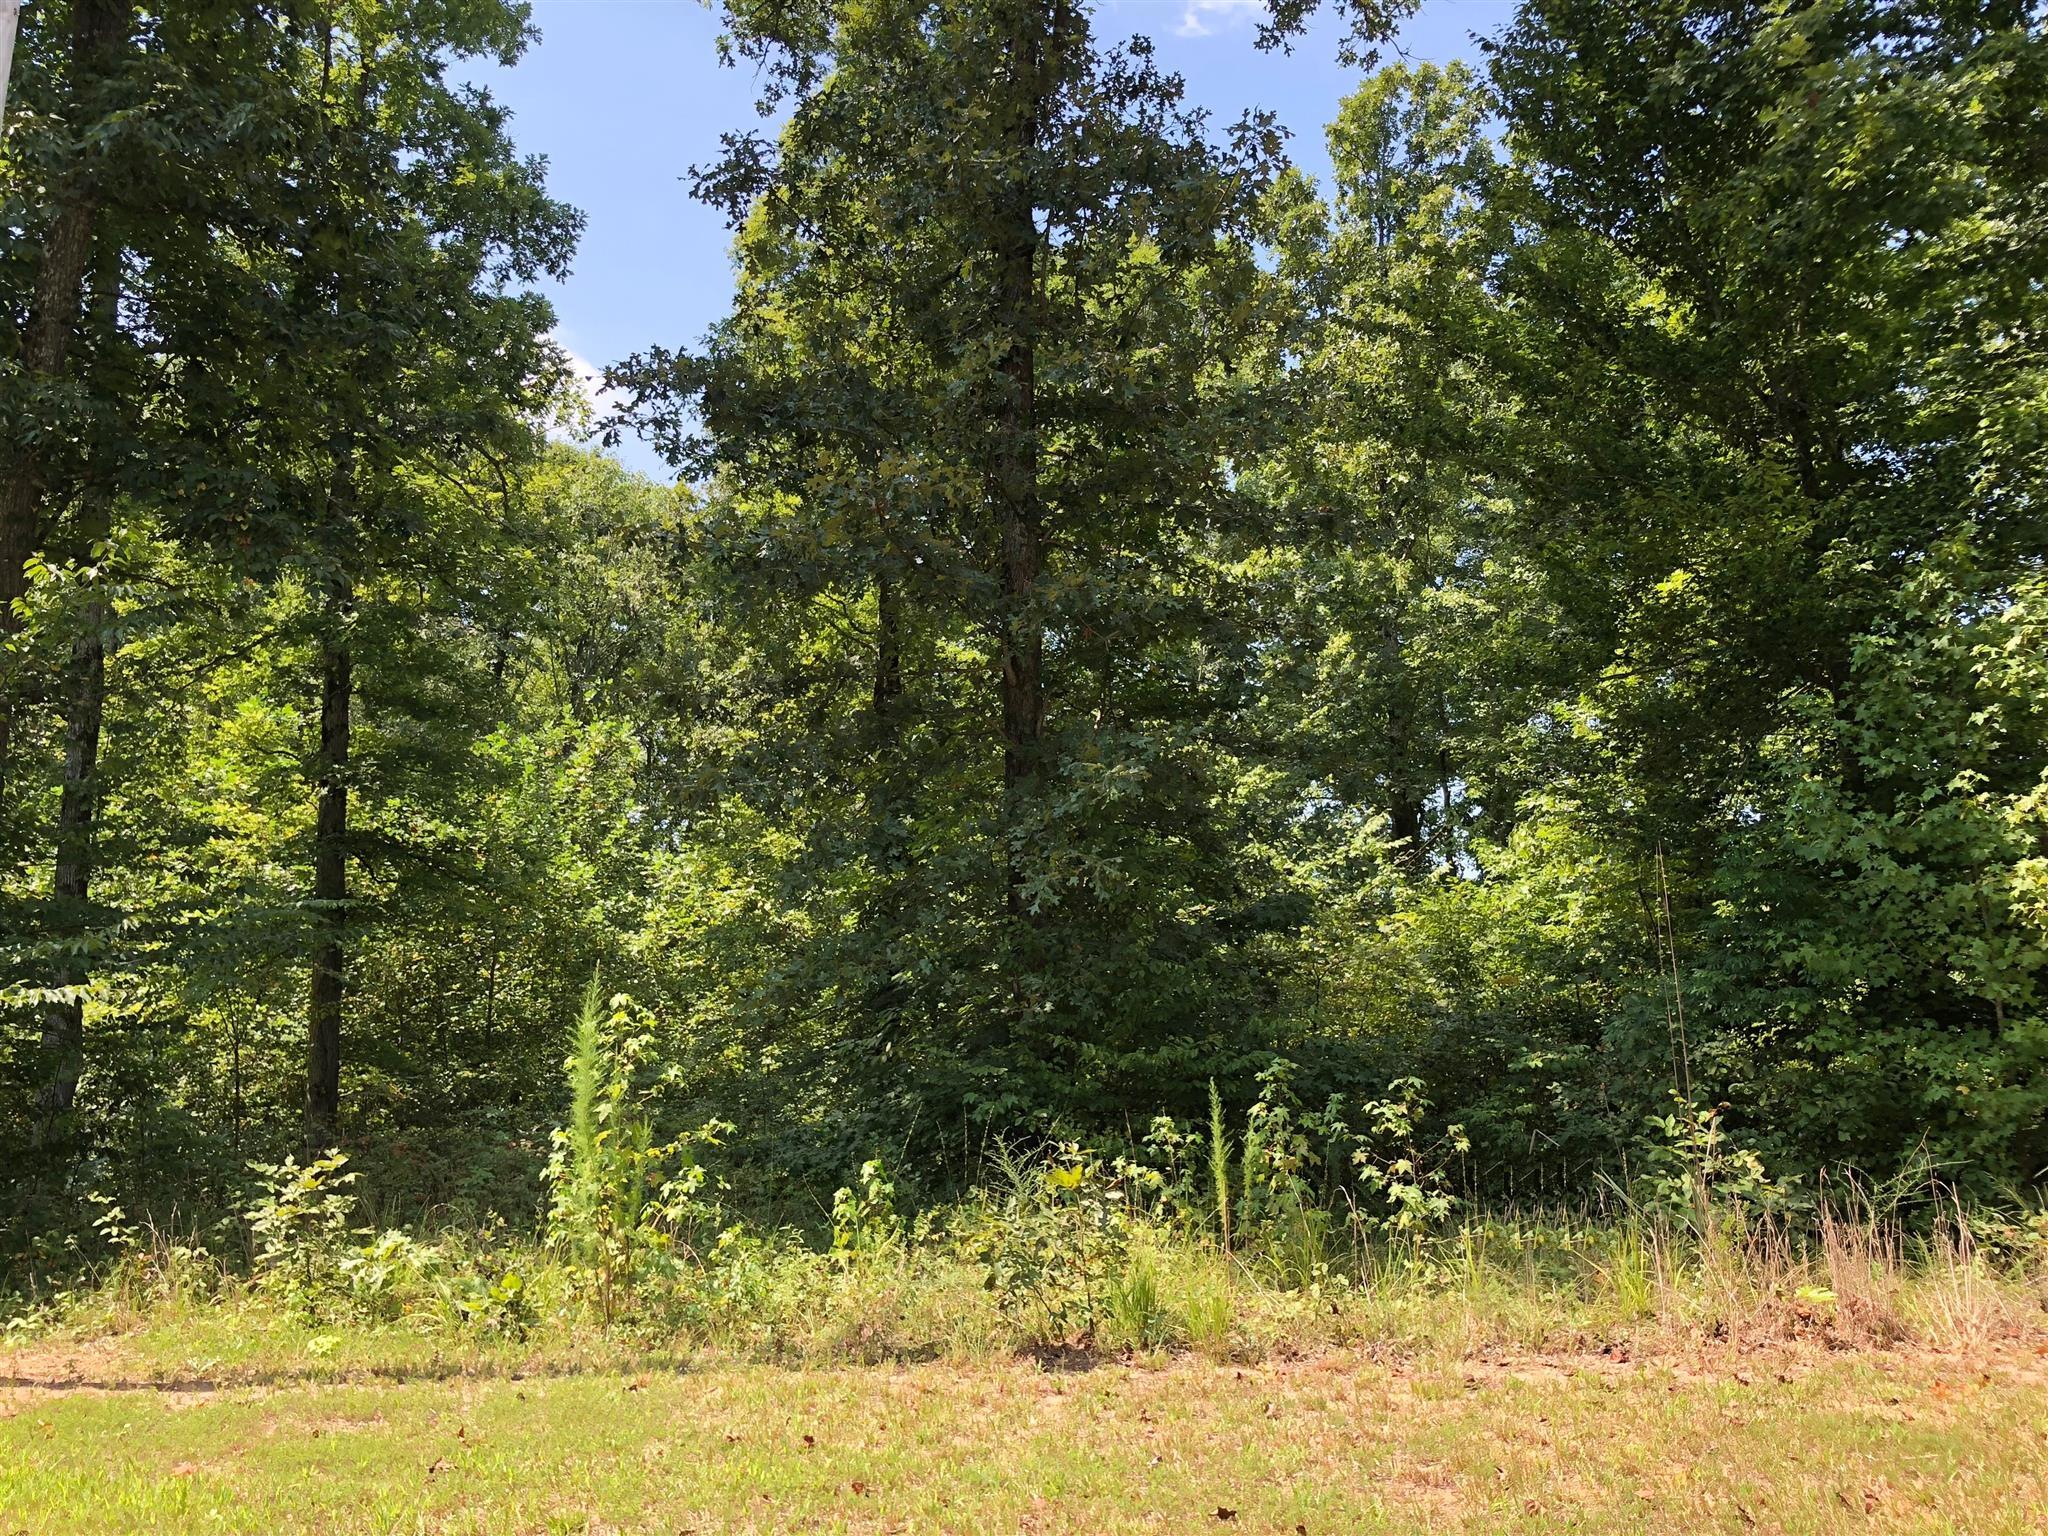 1240 Strike King Dr, Cedar Grove, TN 38321 - Cedar Grove, TN real estate listing